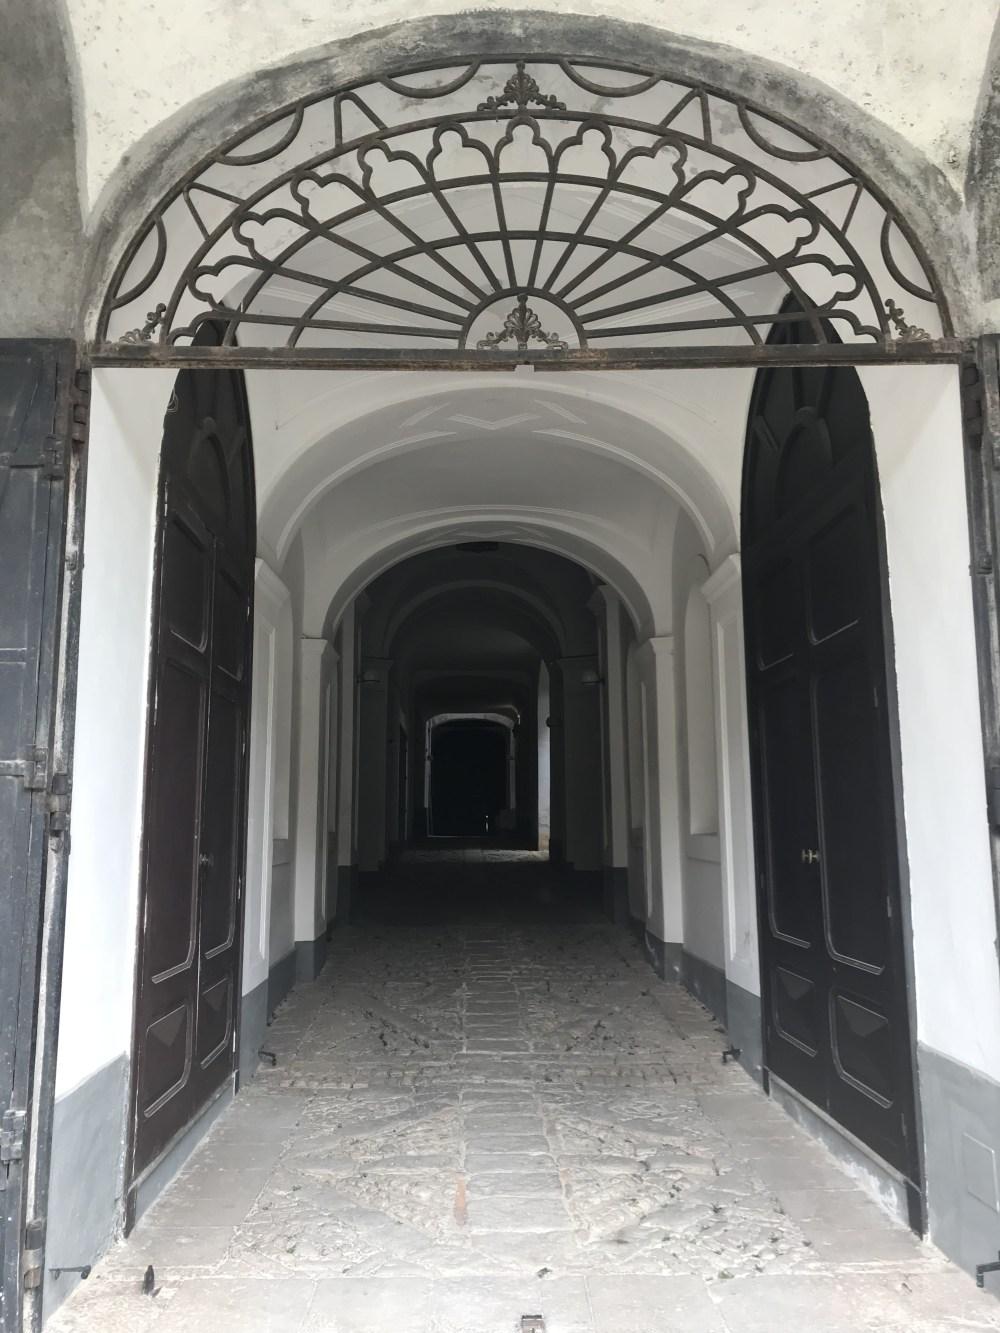 A sólida porta do Castello de Teggiano e seu corredor frio que nos deram medo na noite de chegada